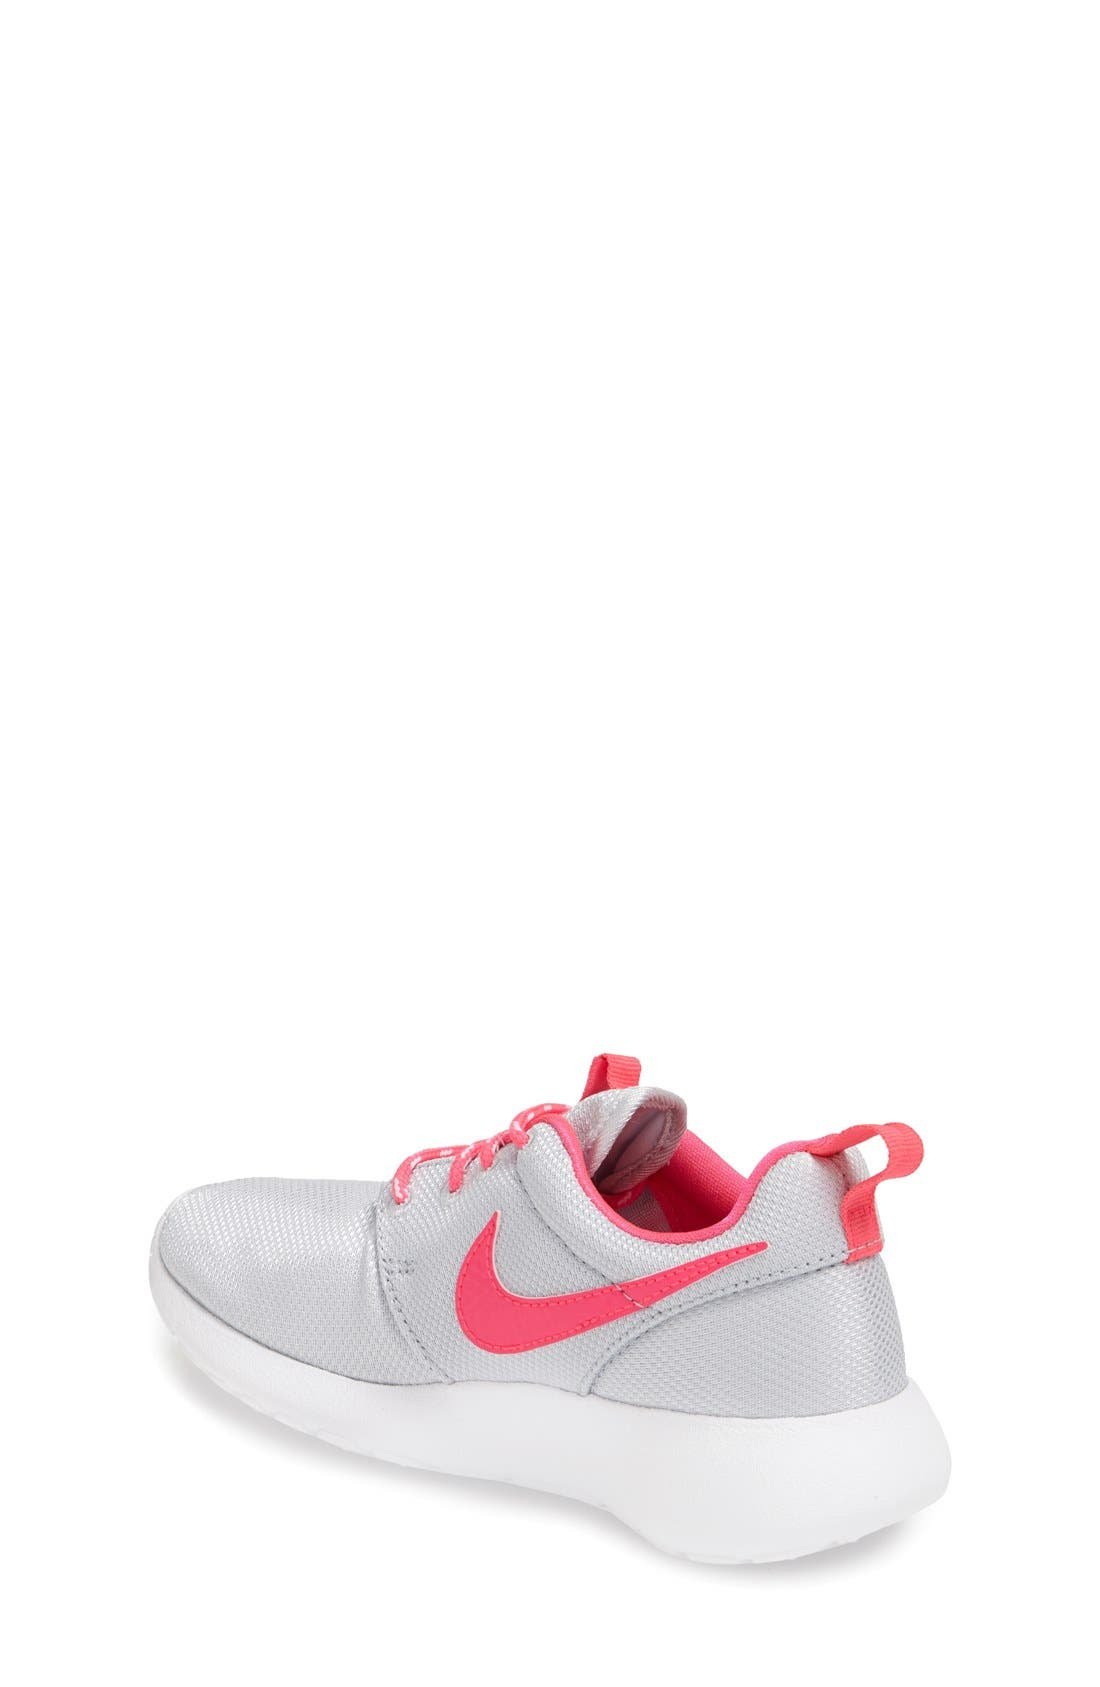 'Roshe Run' Athletic Shoe,                             Alternate thumbnail 124, color,